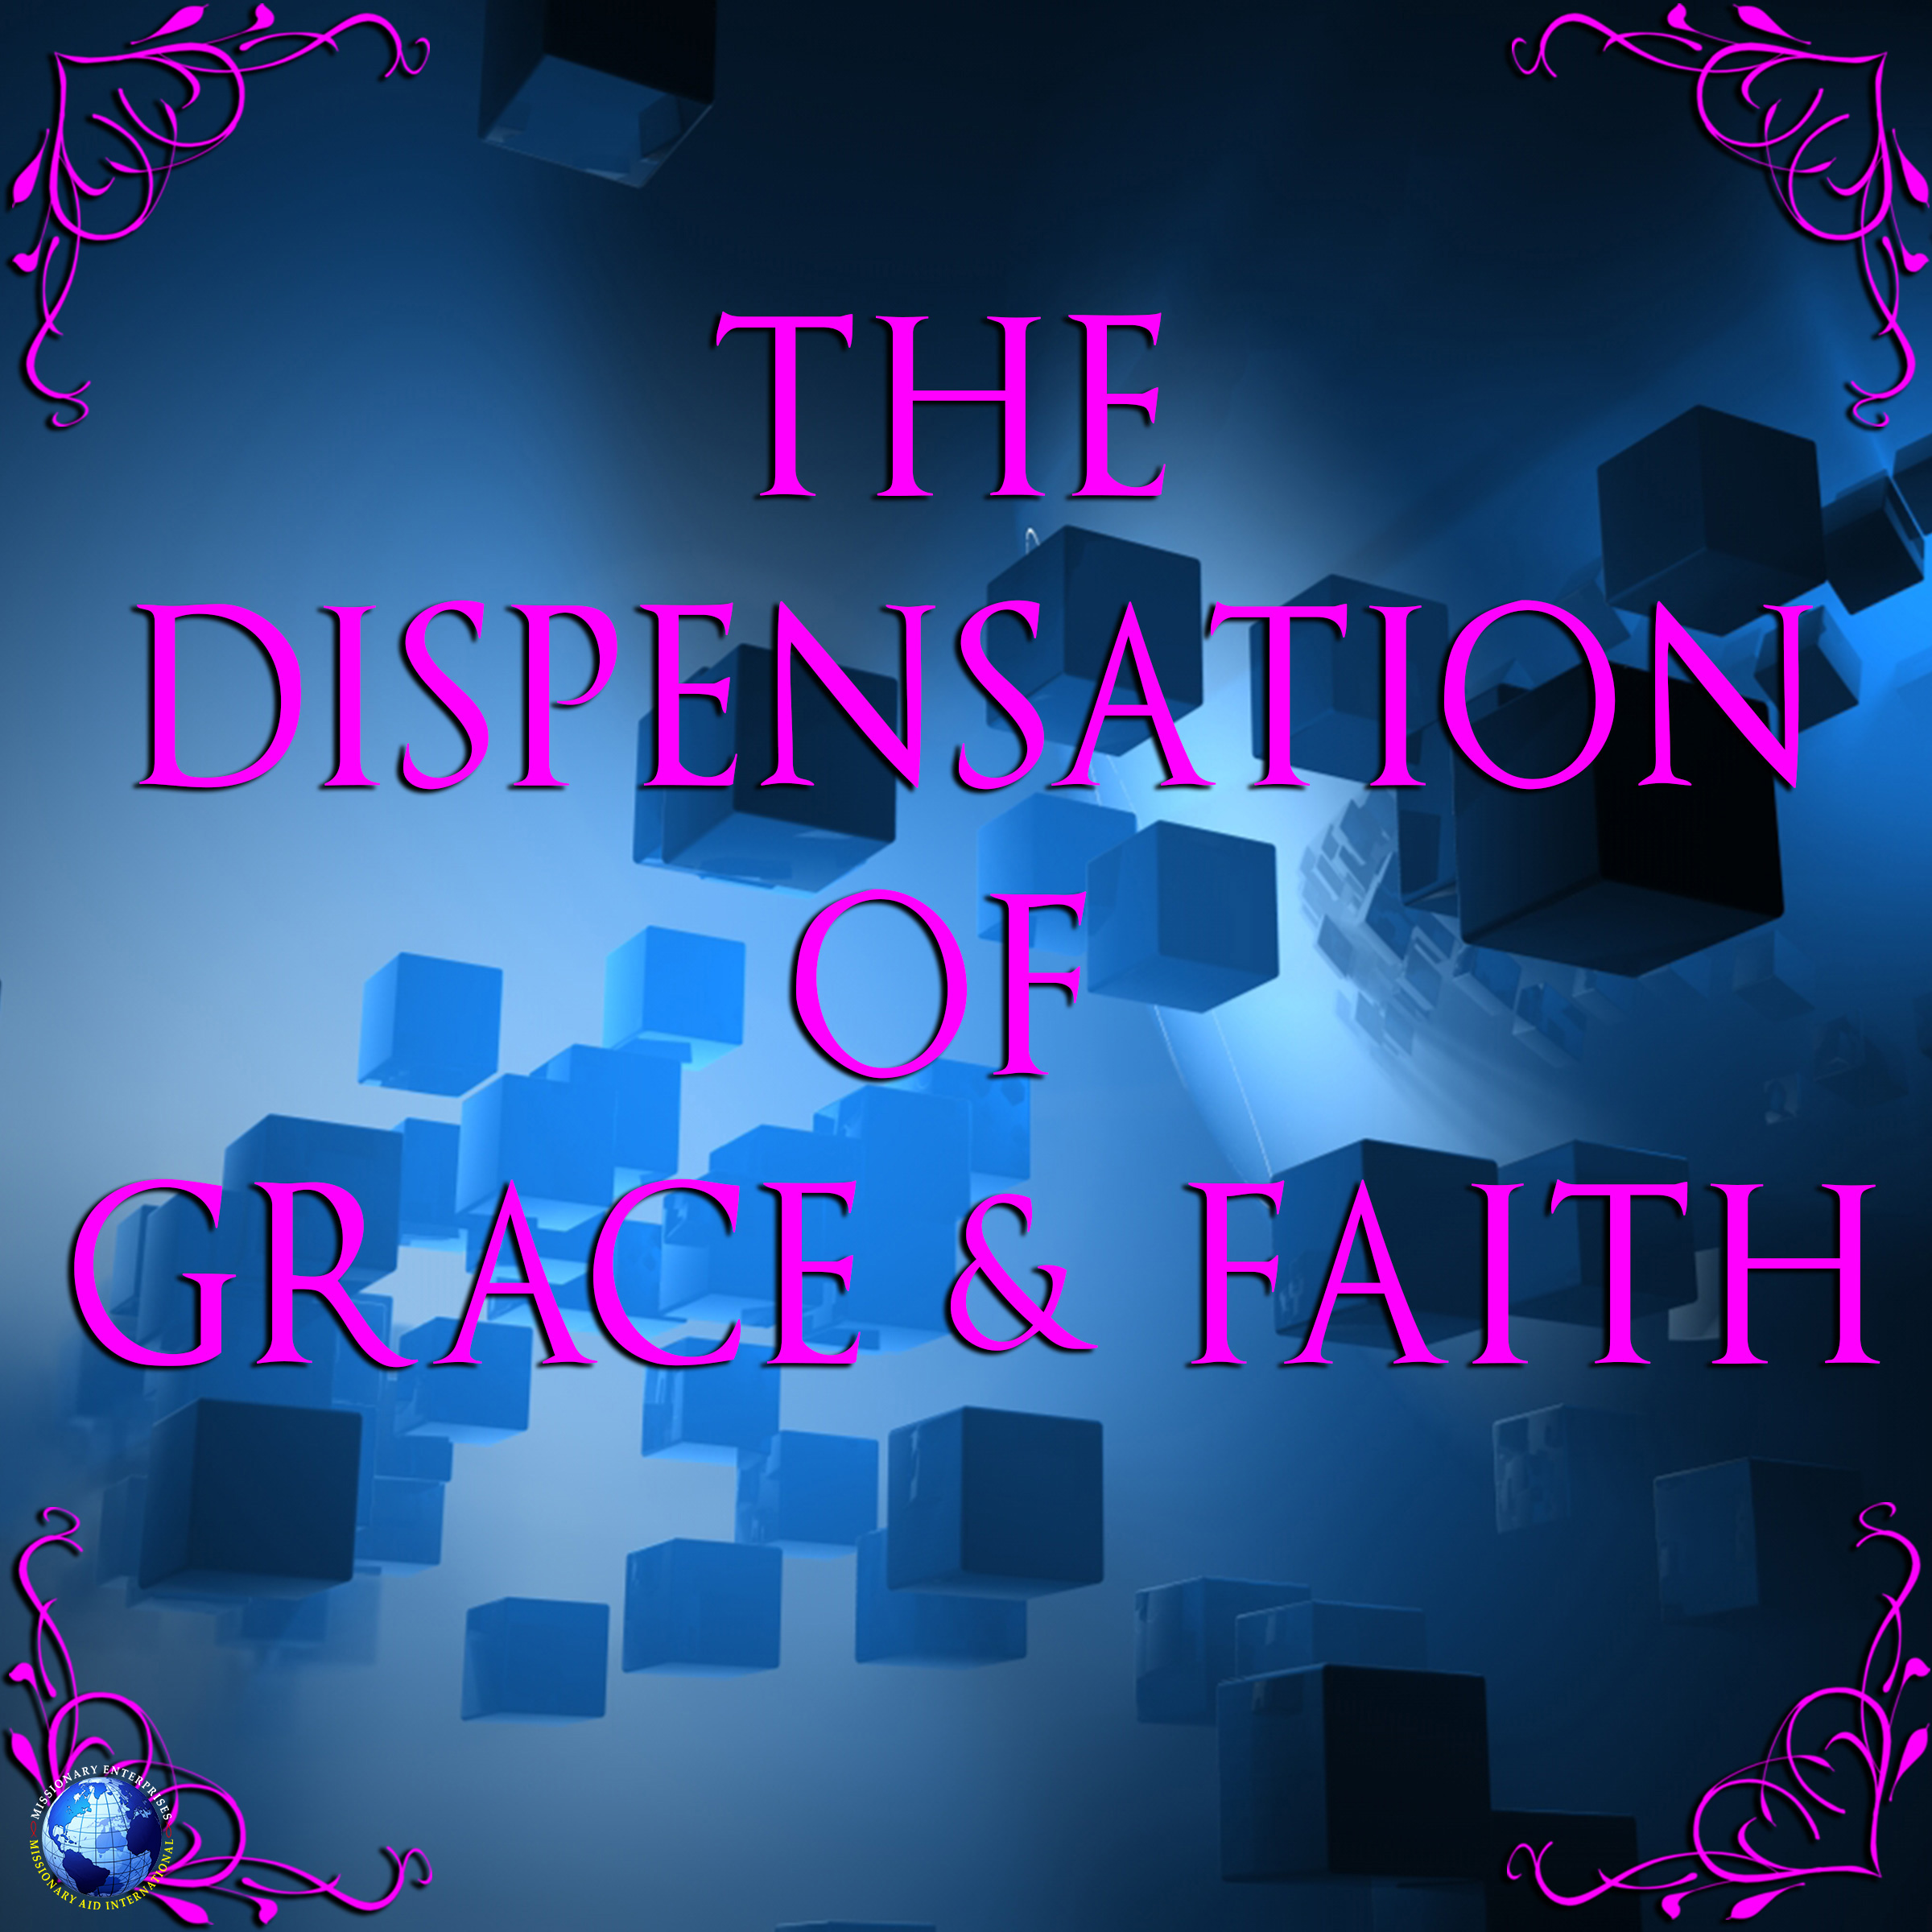 The Dispensation of Grace & Faith